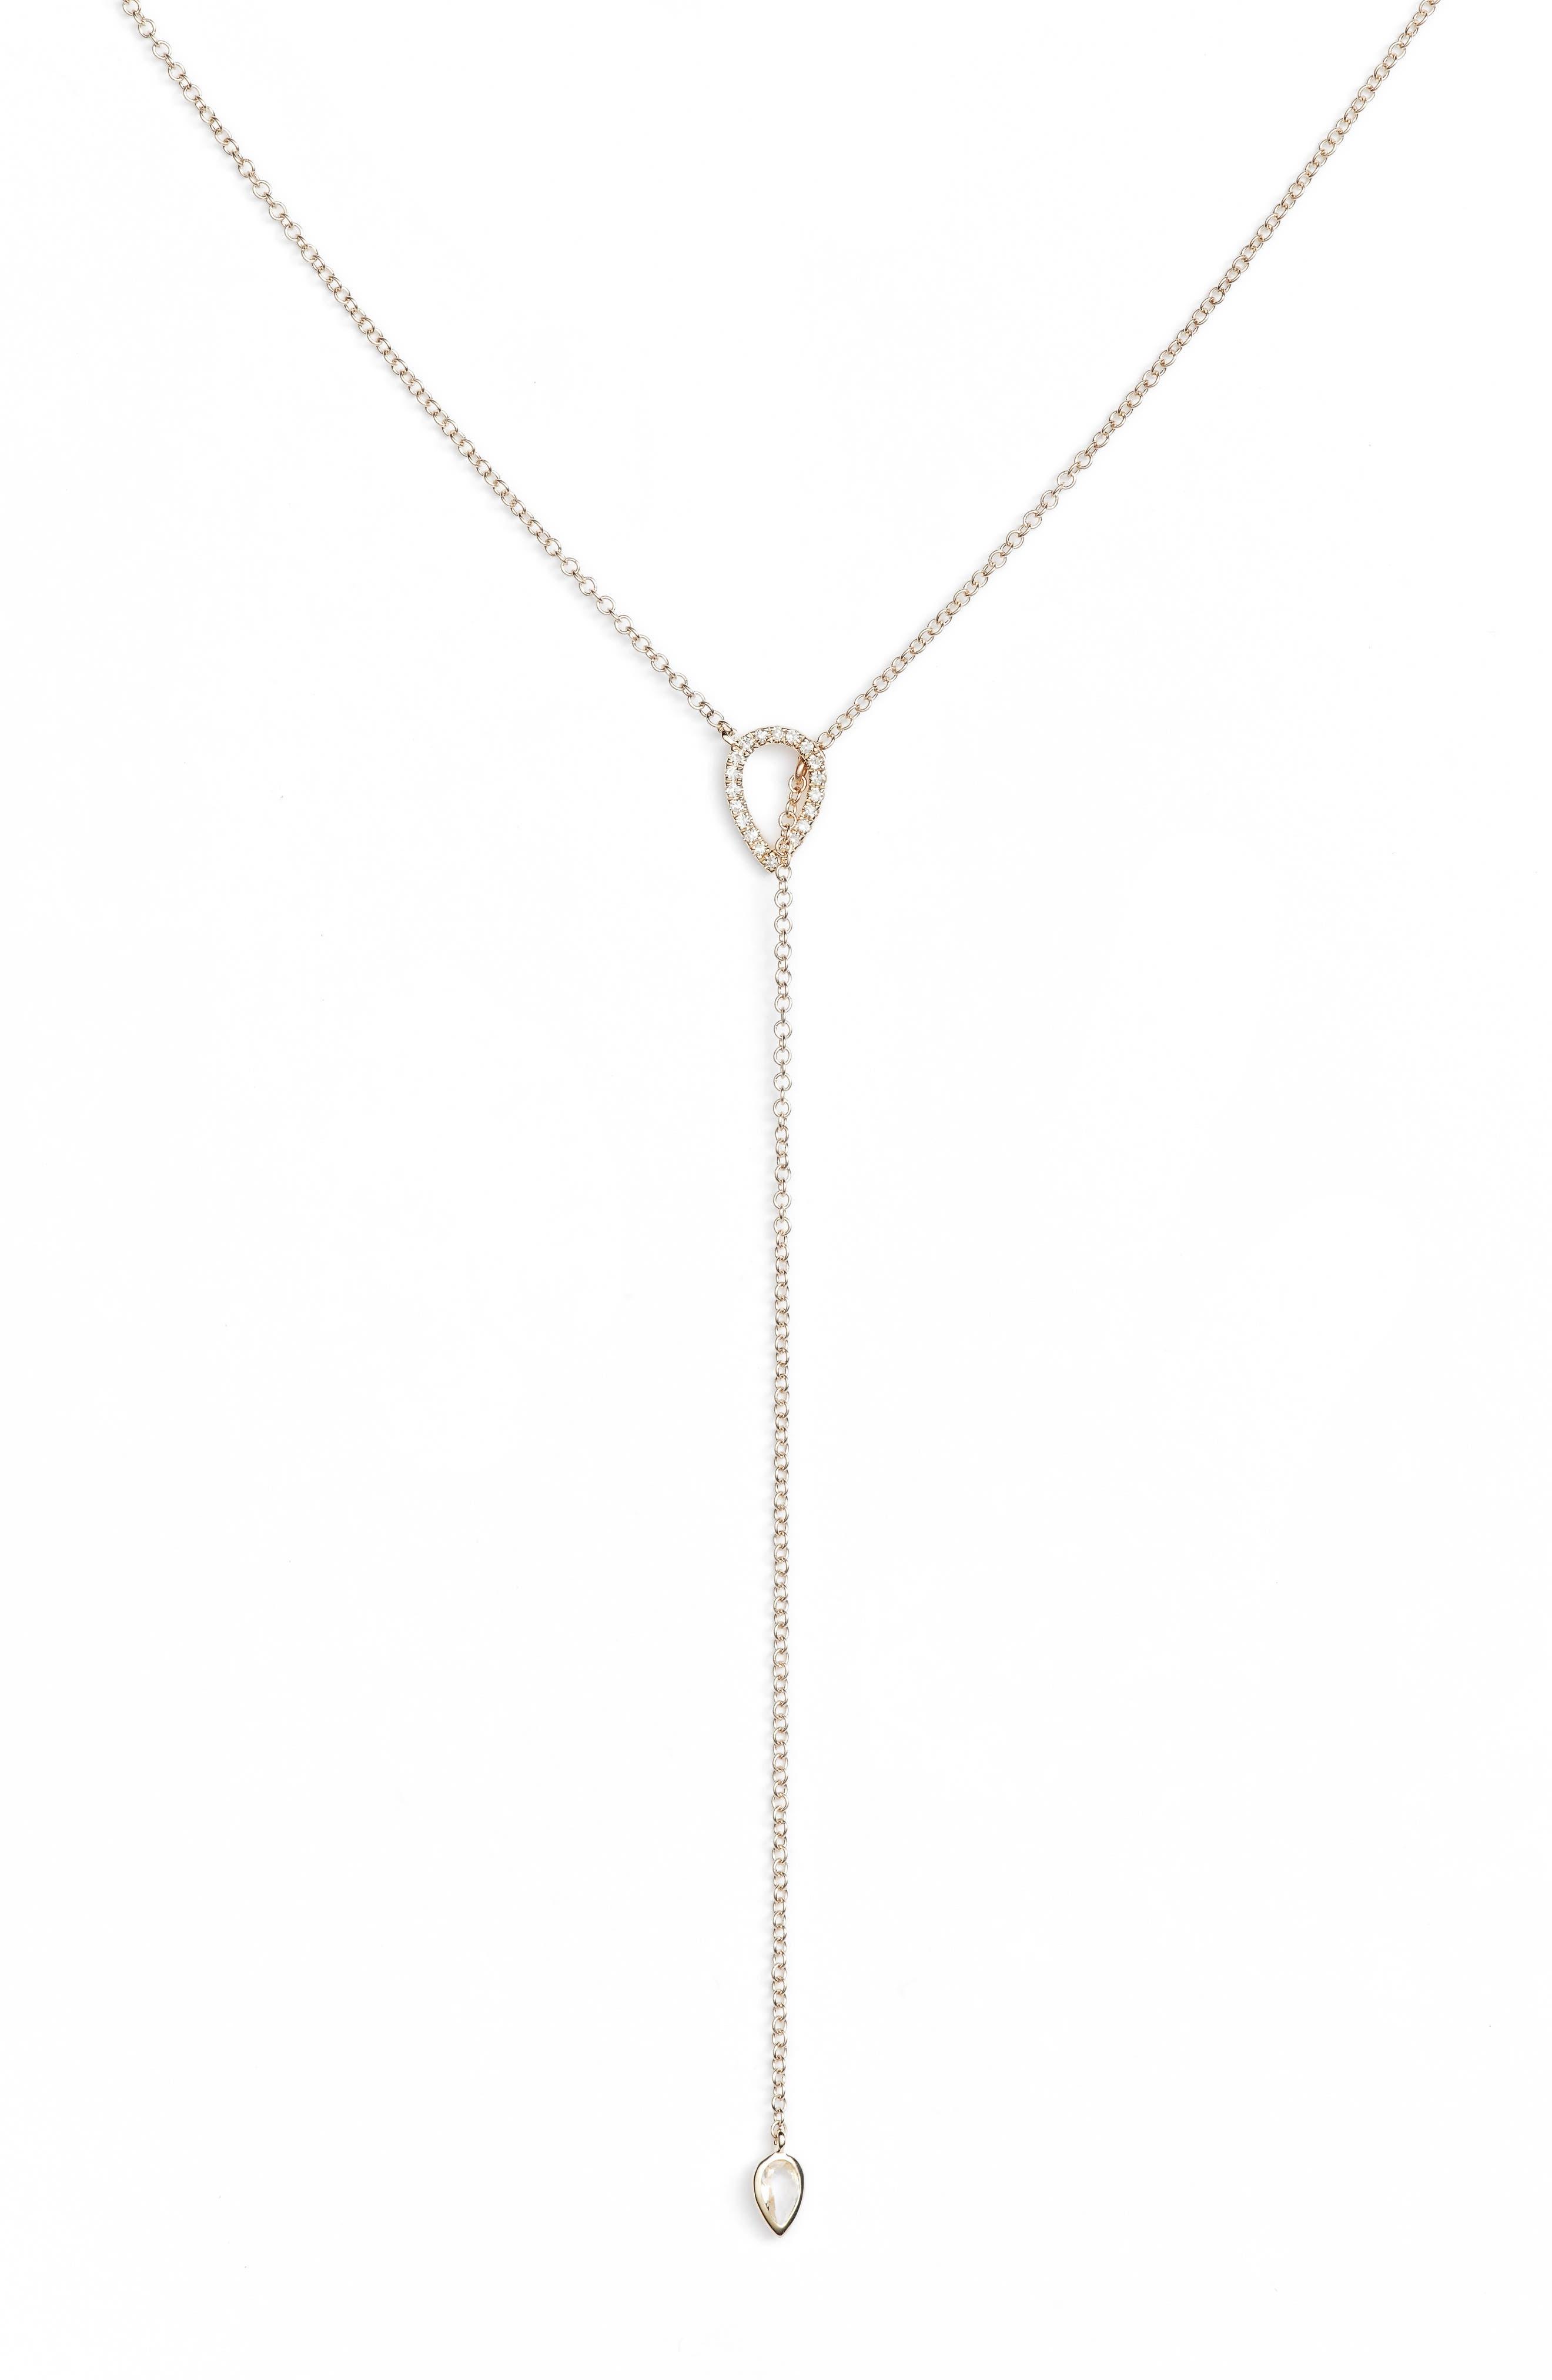 Teardrop Diamond Lariat Necklace,                         Main,                         color, YELLOW GOLD